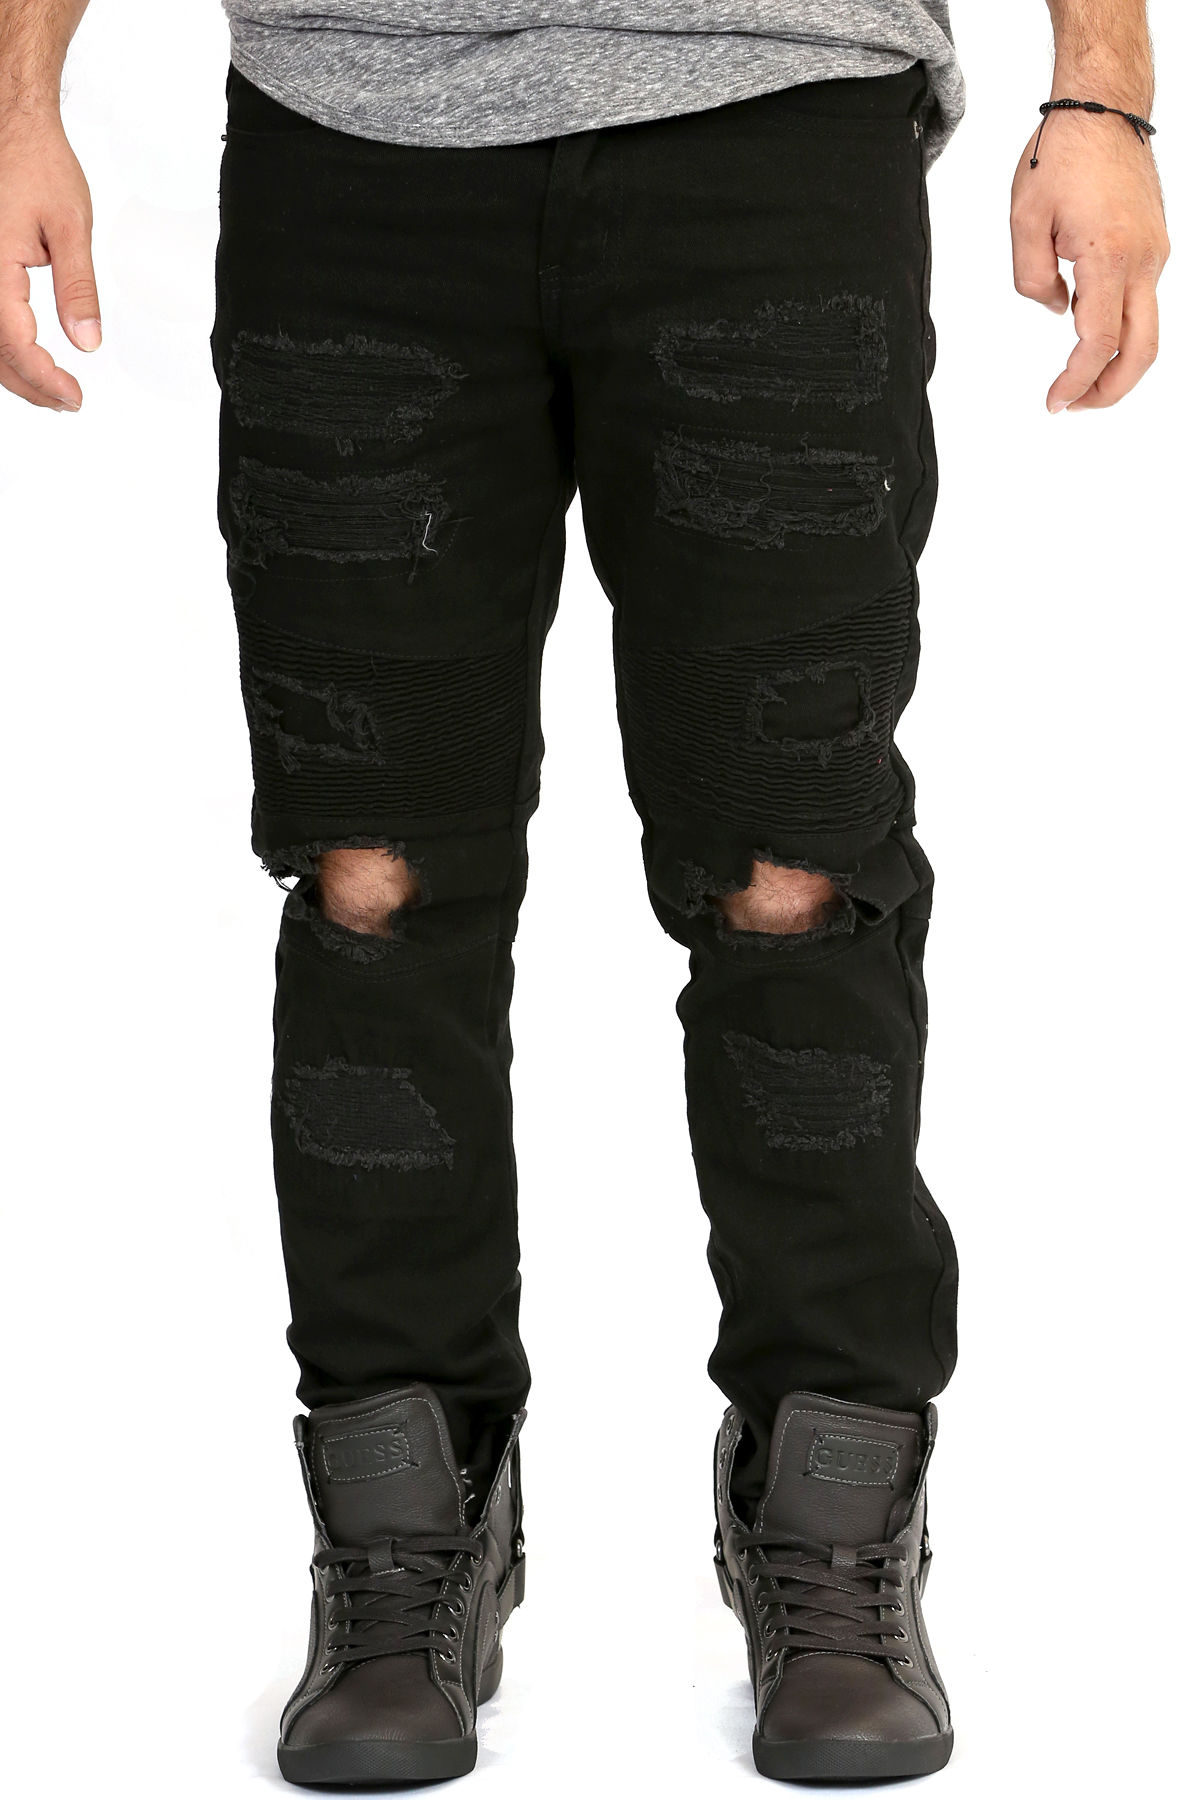 Image of Ripped Knee Skinny Jeans in Jet Black